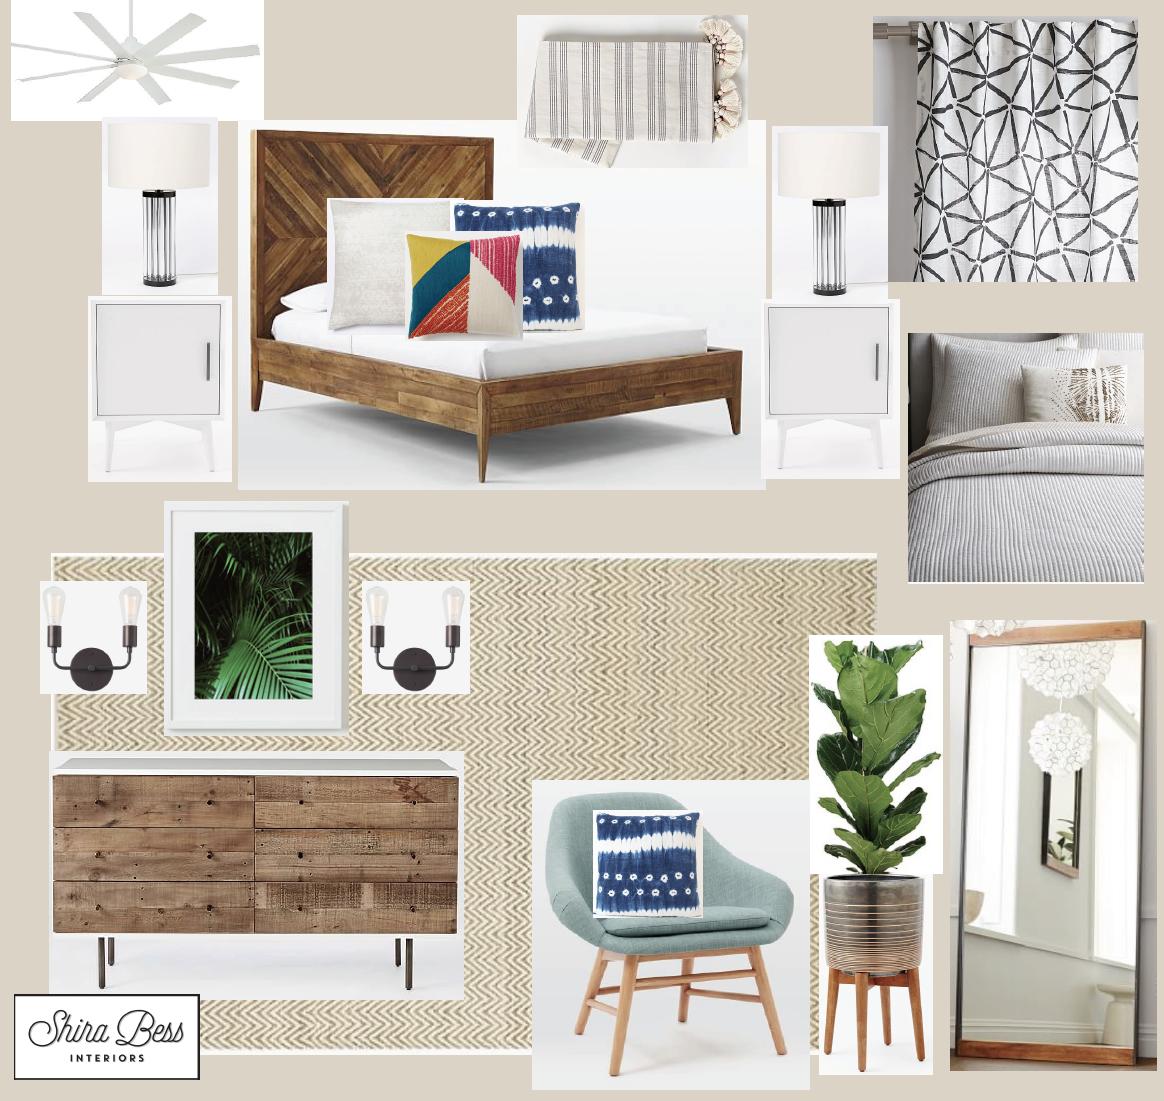 Naples Master Bedroom - Option 2